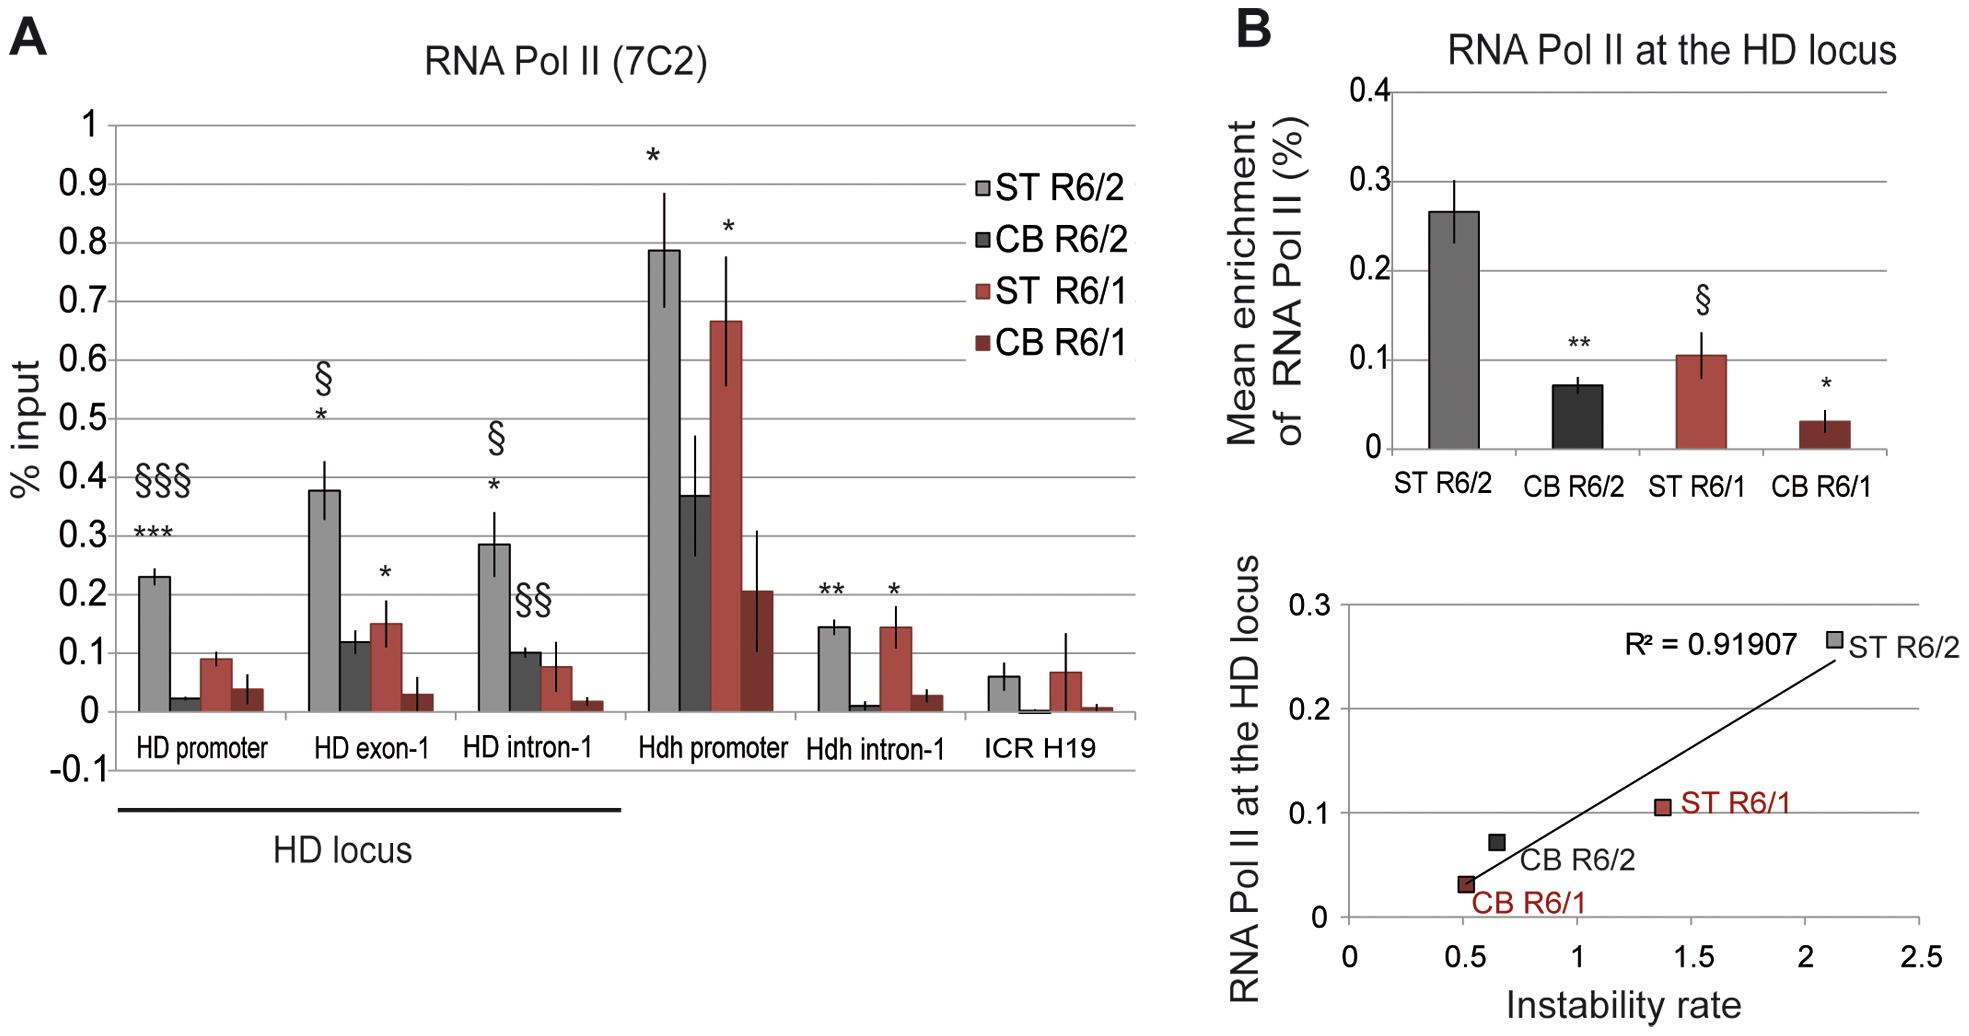 RNA Pol II at the HD locus in R6/1 and R6/2 striatum and cerebellum.